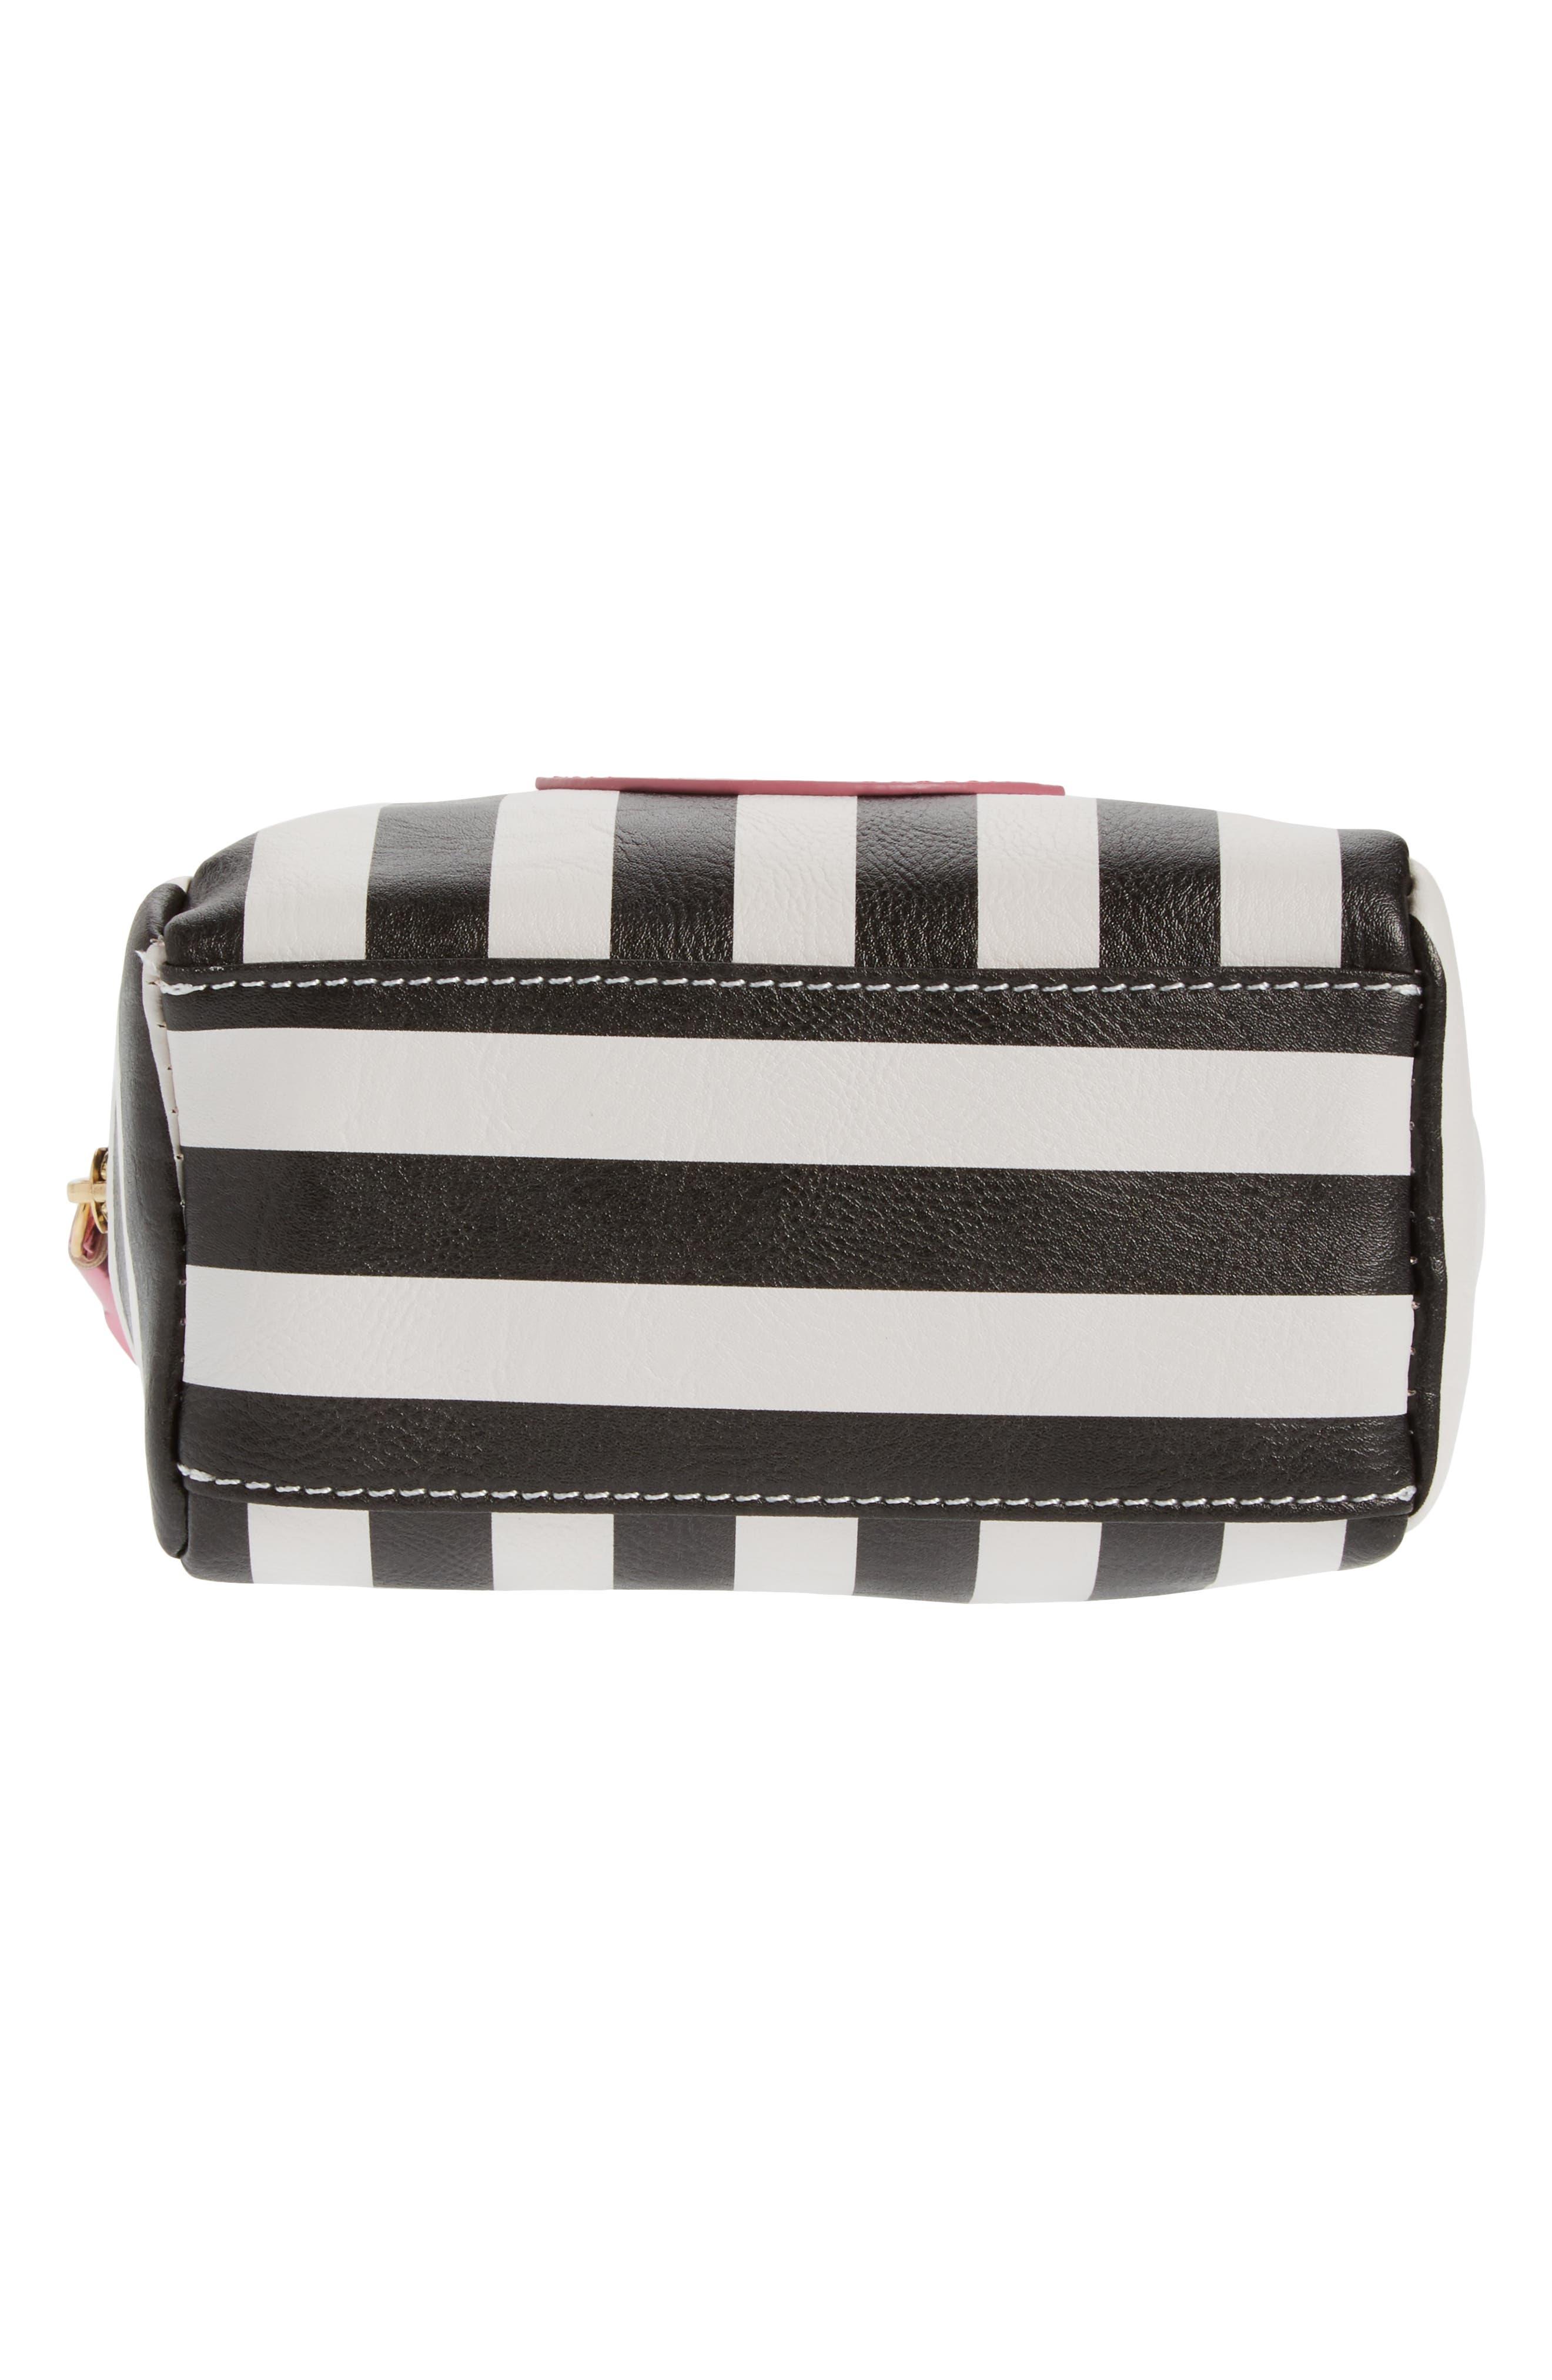 Metallic Lip Stripe Cosmetics Bag,                             Alternate thumbnail 5, color,                             001